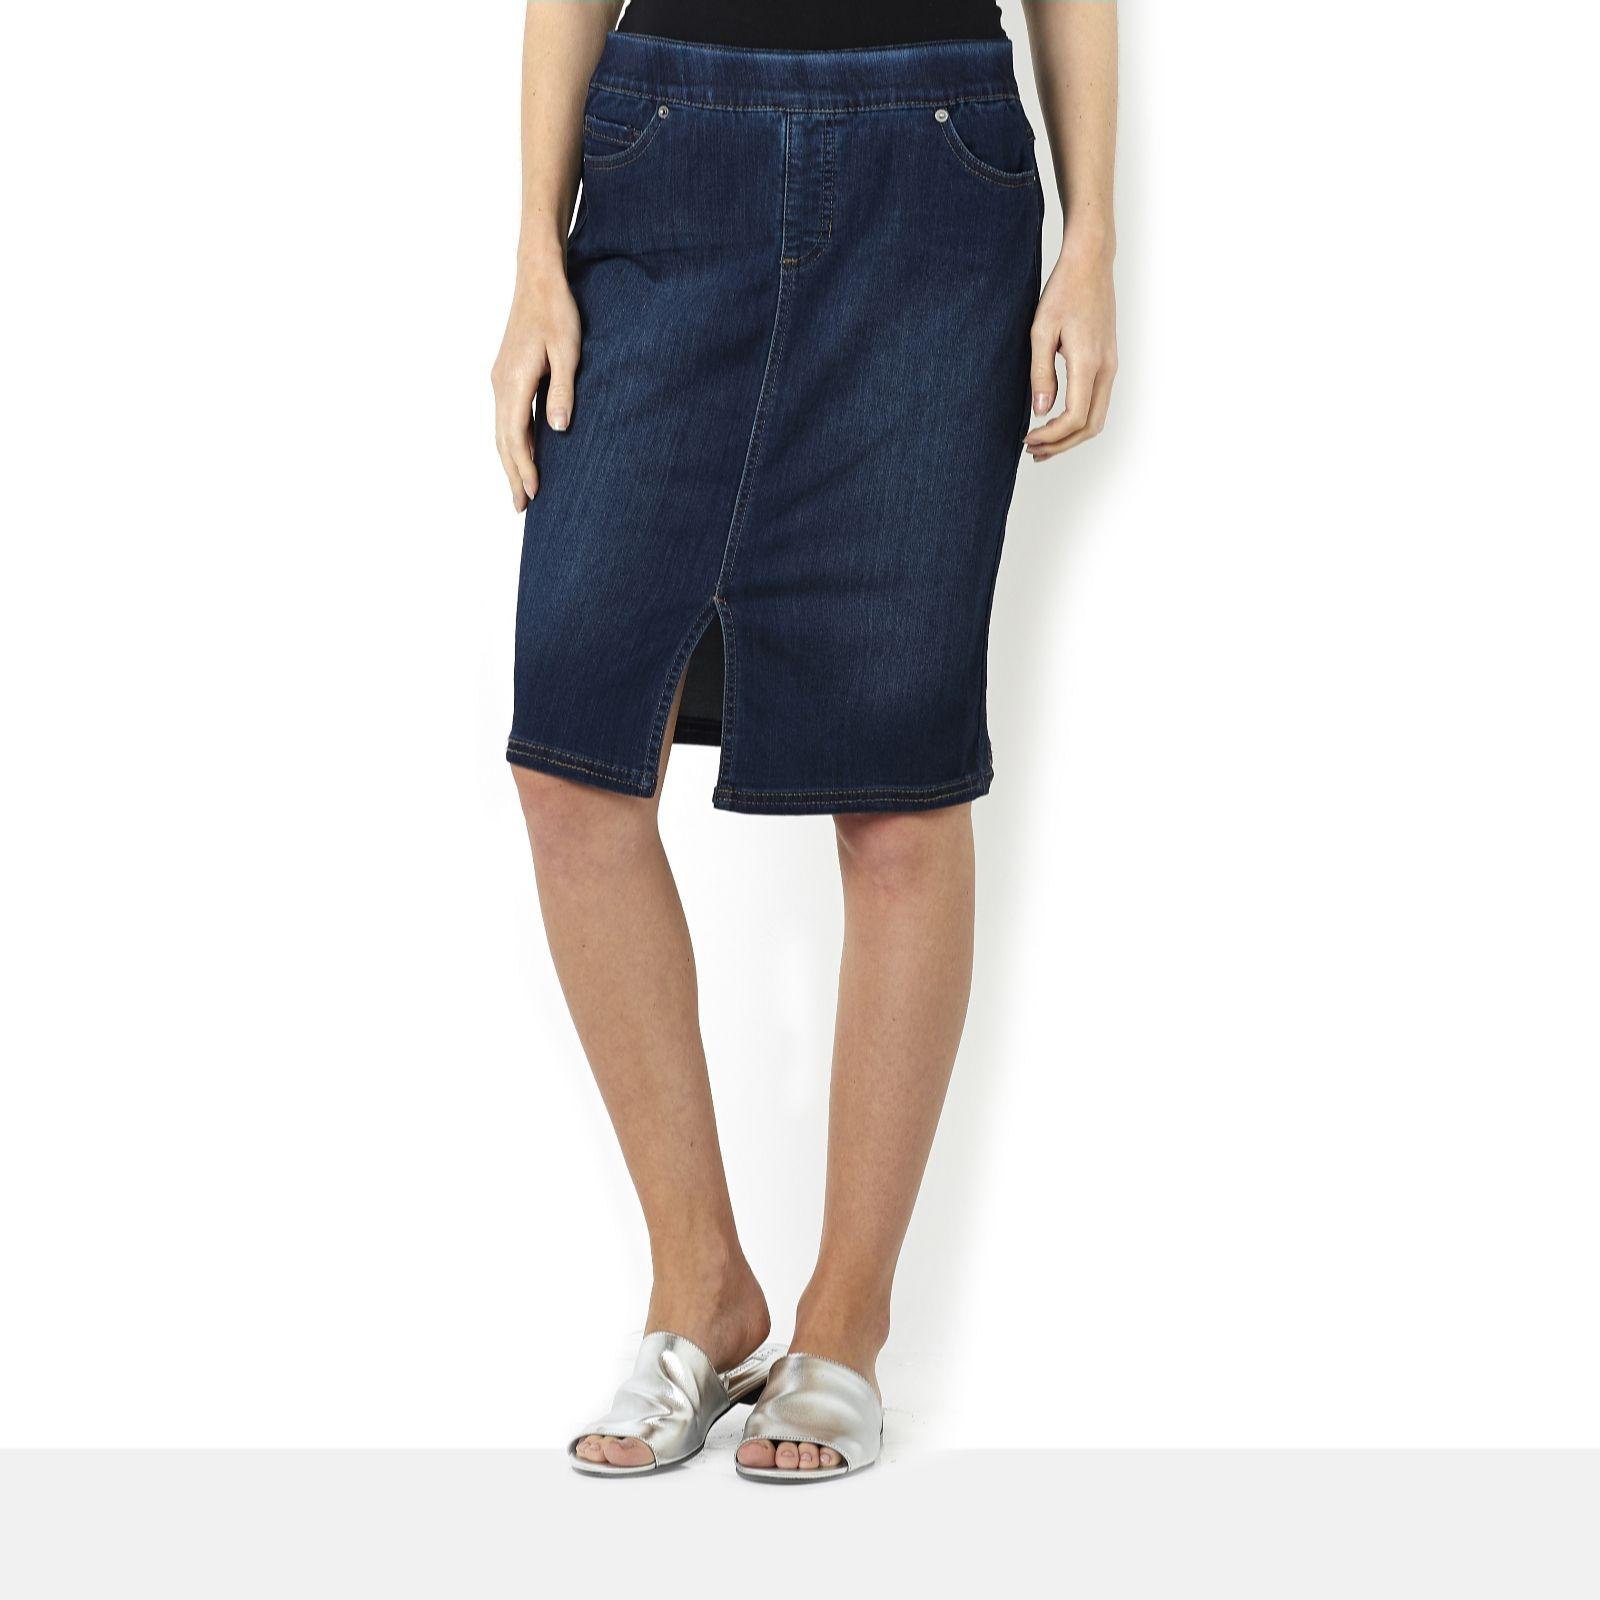 Skirts - QVC UK